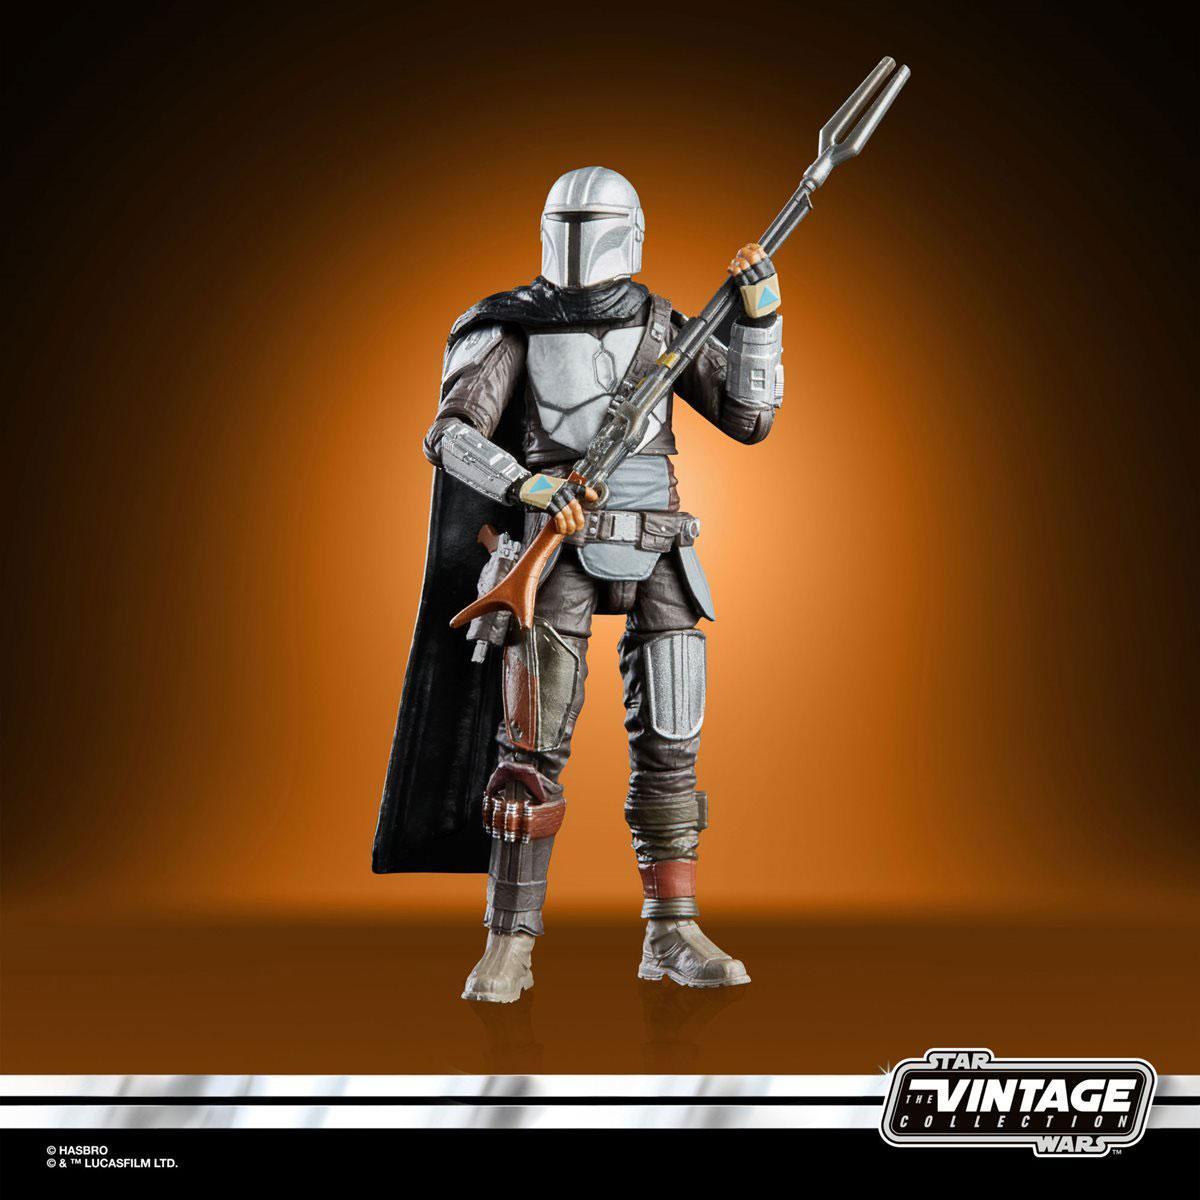 star-wars-vintage-collection-mandalorian-in-beskar-armor-action-figure-2